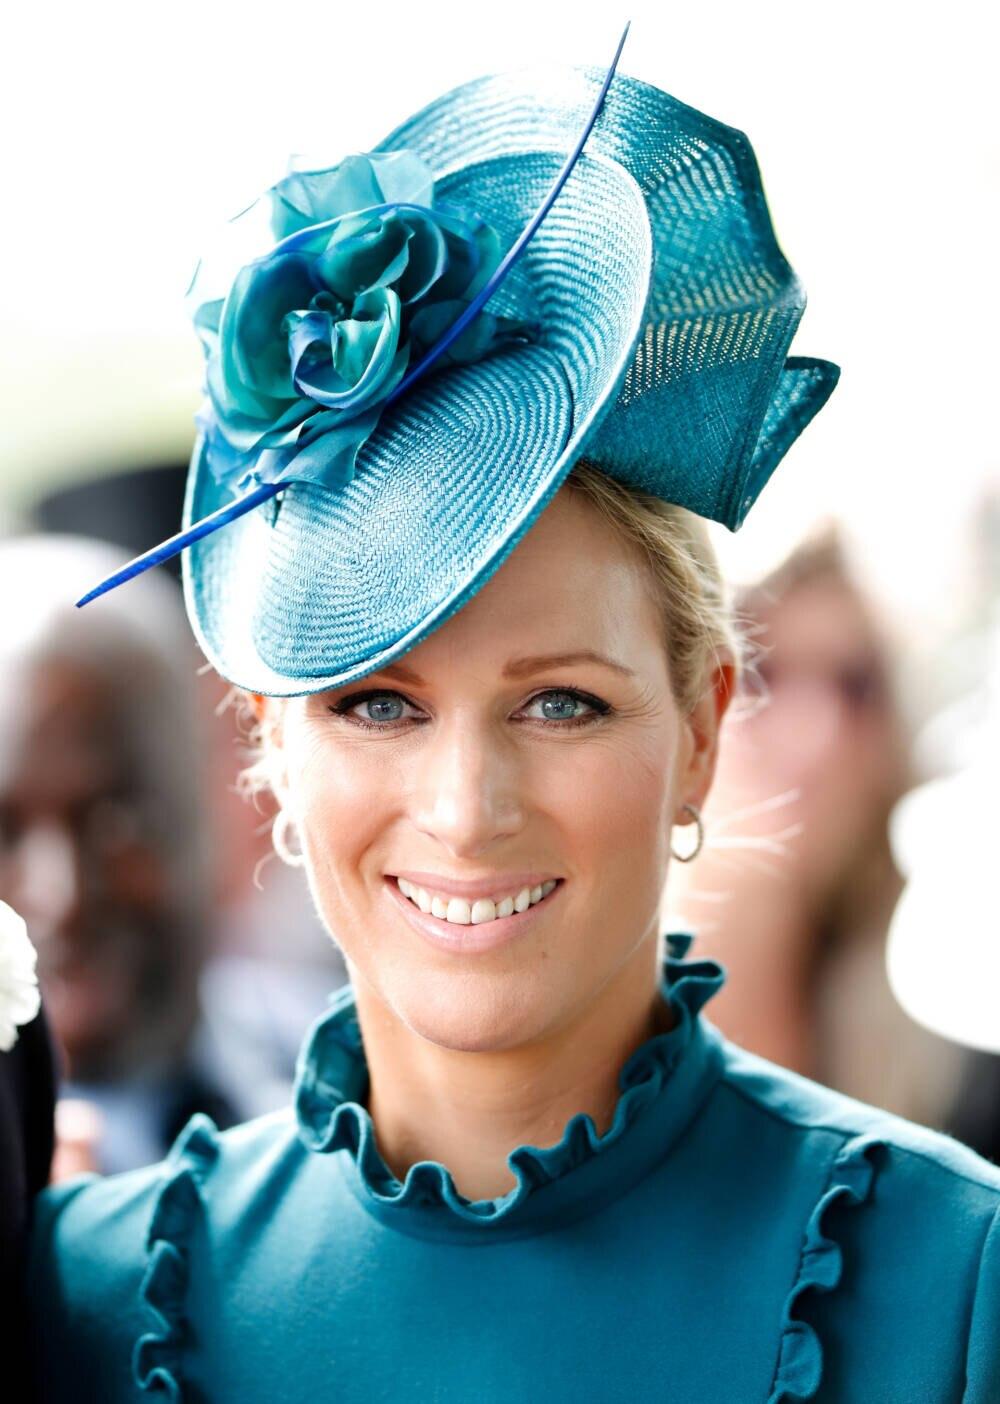 Zara Tindall beim Royal Ascot